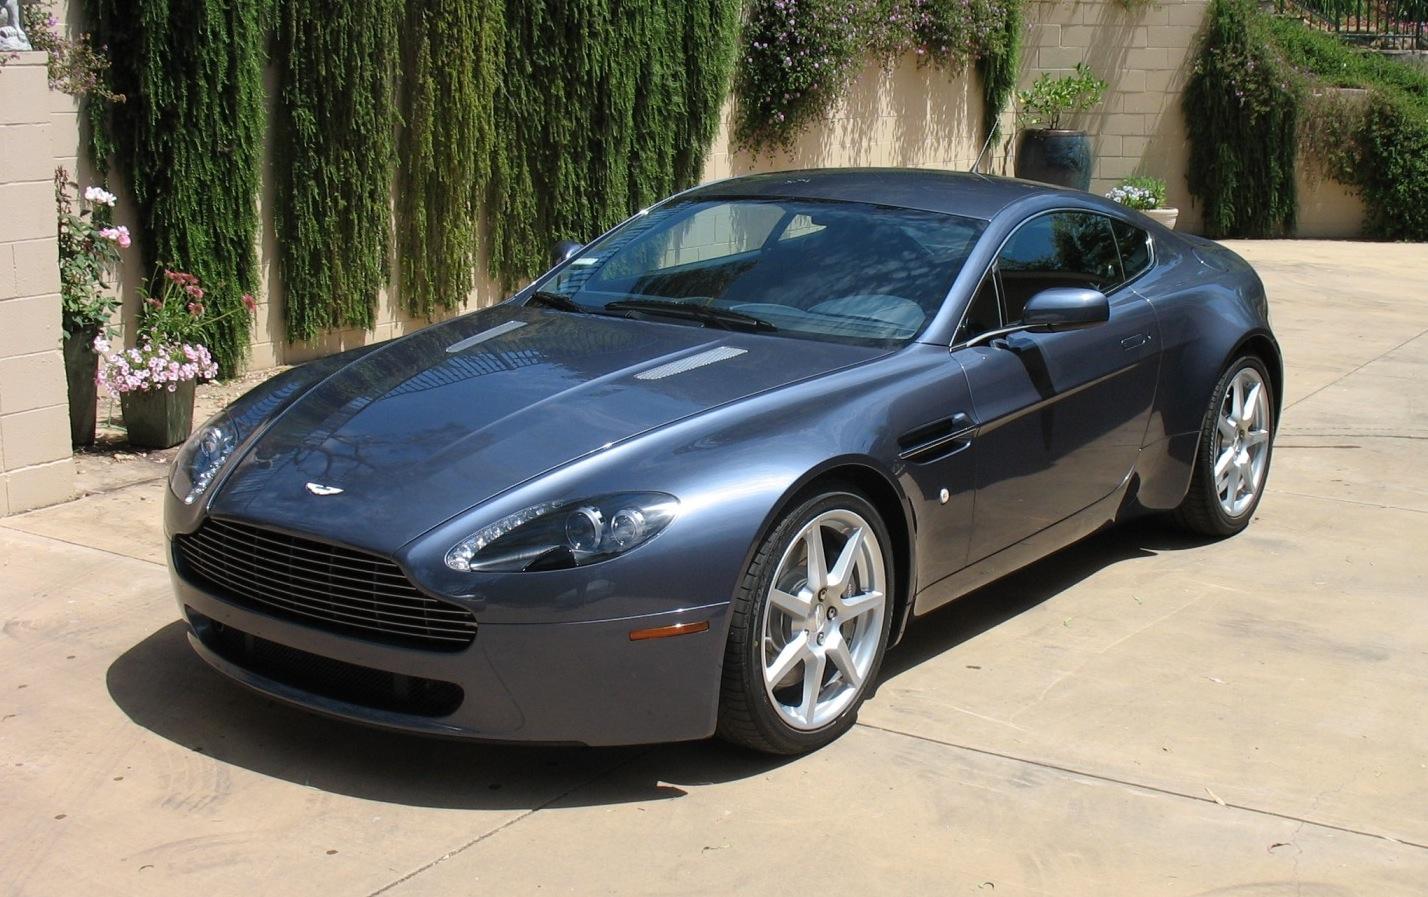 Aston Martin V8 Vantage Looks Good And Goes Fast Mycarquest Com